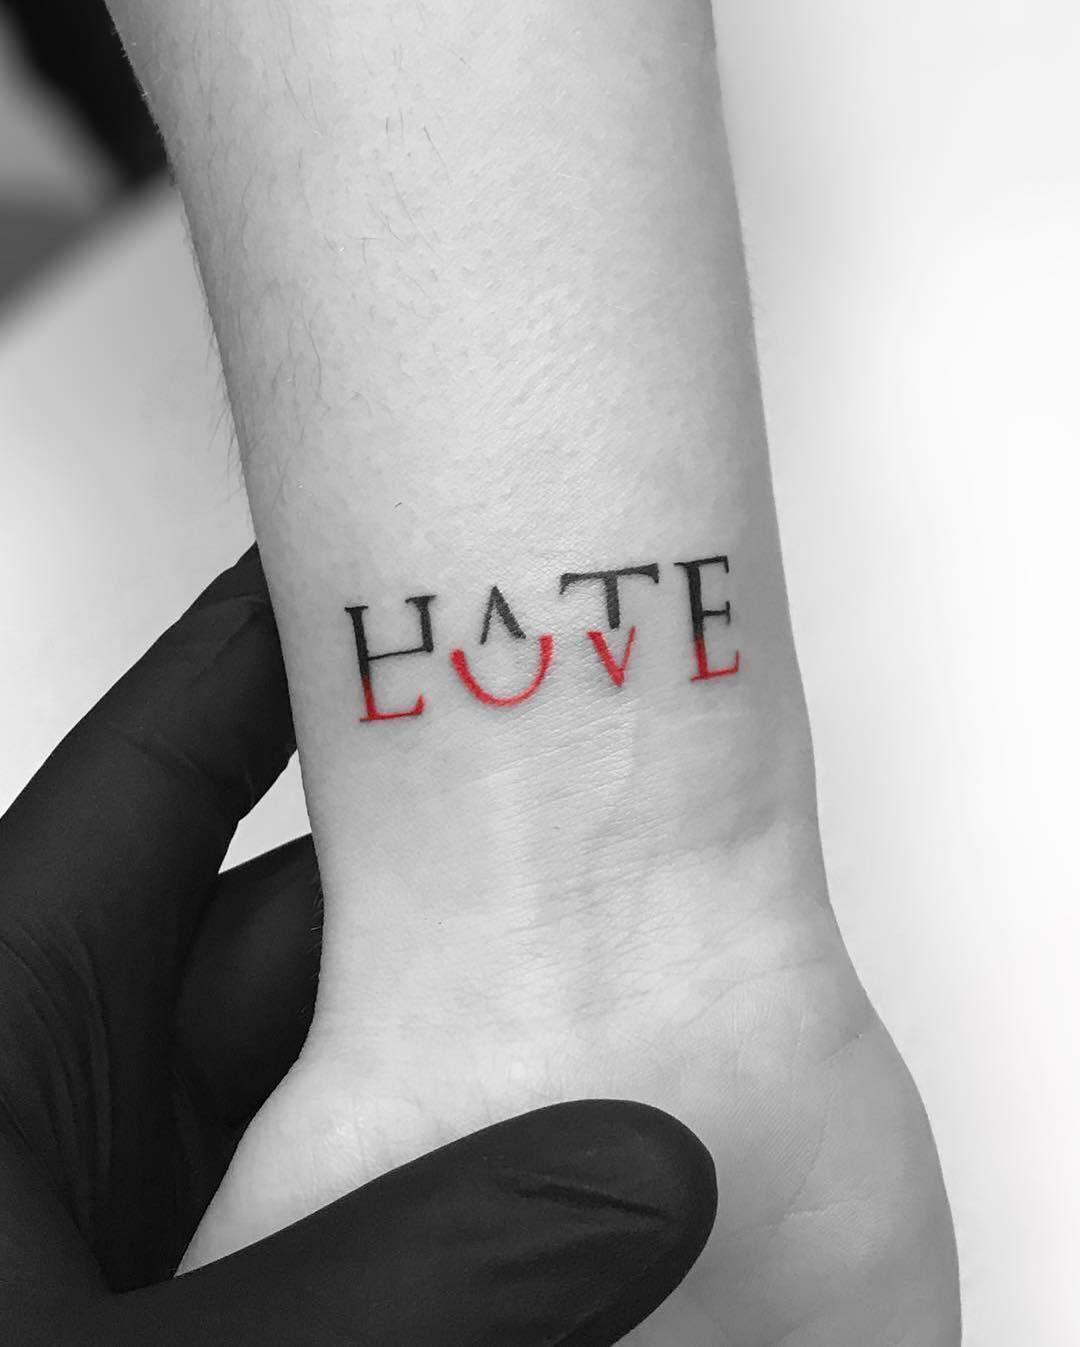 Top 70 Cute Tattoo Design Ideas For Girls Howlives - part 40 - 70 tattoo -...  #Cute #Design #Girls #Howlives